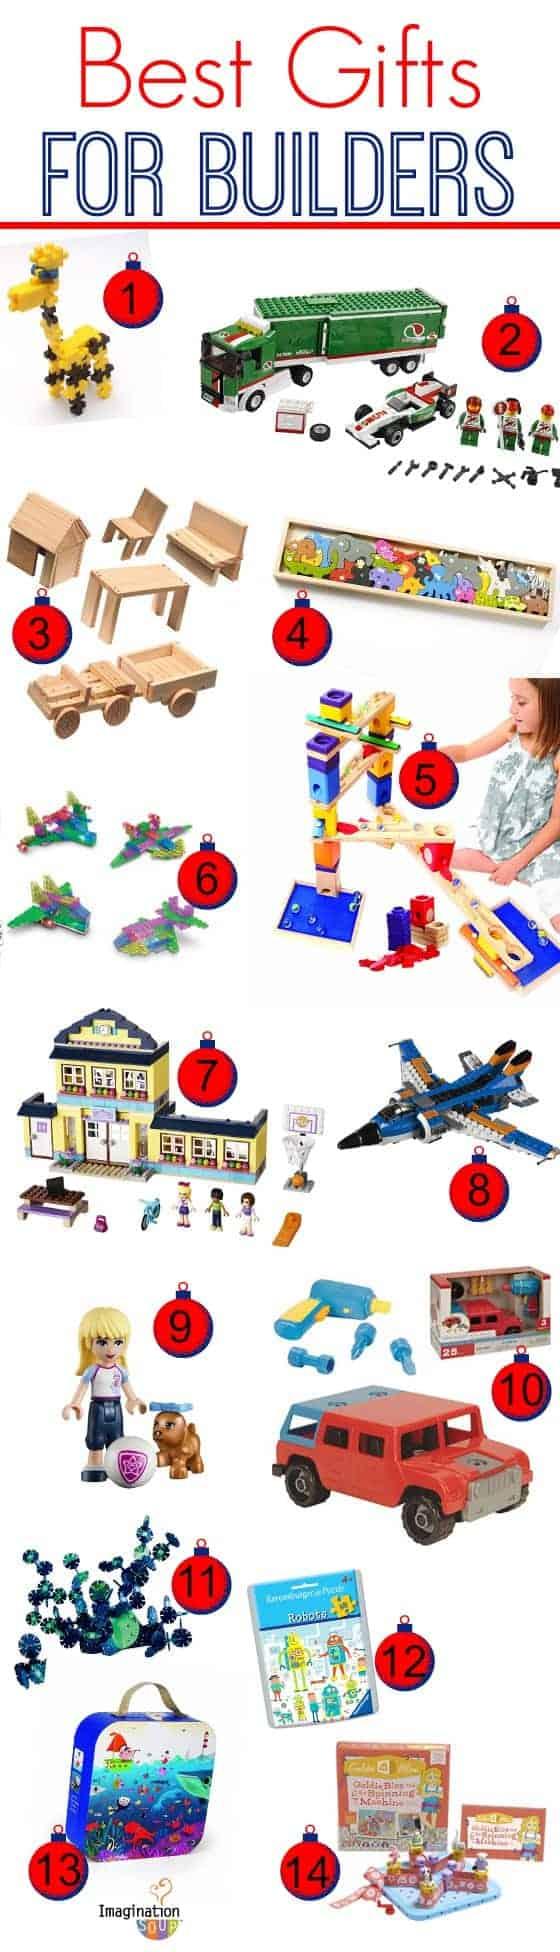 Best Building Toys For Kids : Best building toys for kids imagination soup